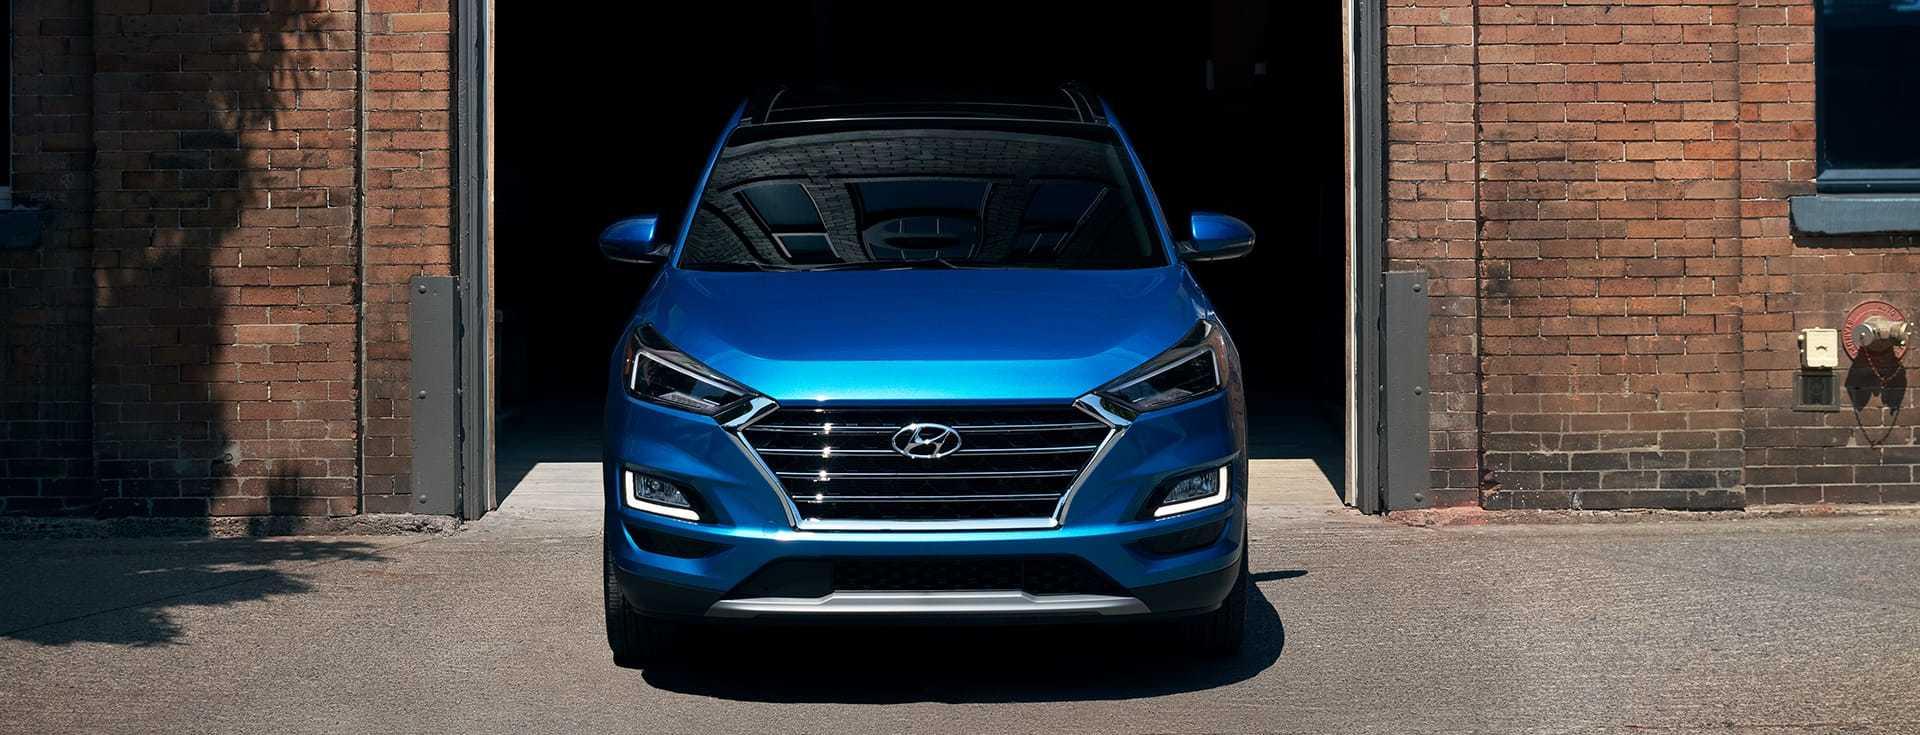 2020 Hyundai Tucson Lease in Goshen, NY